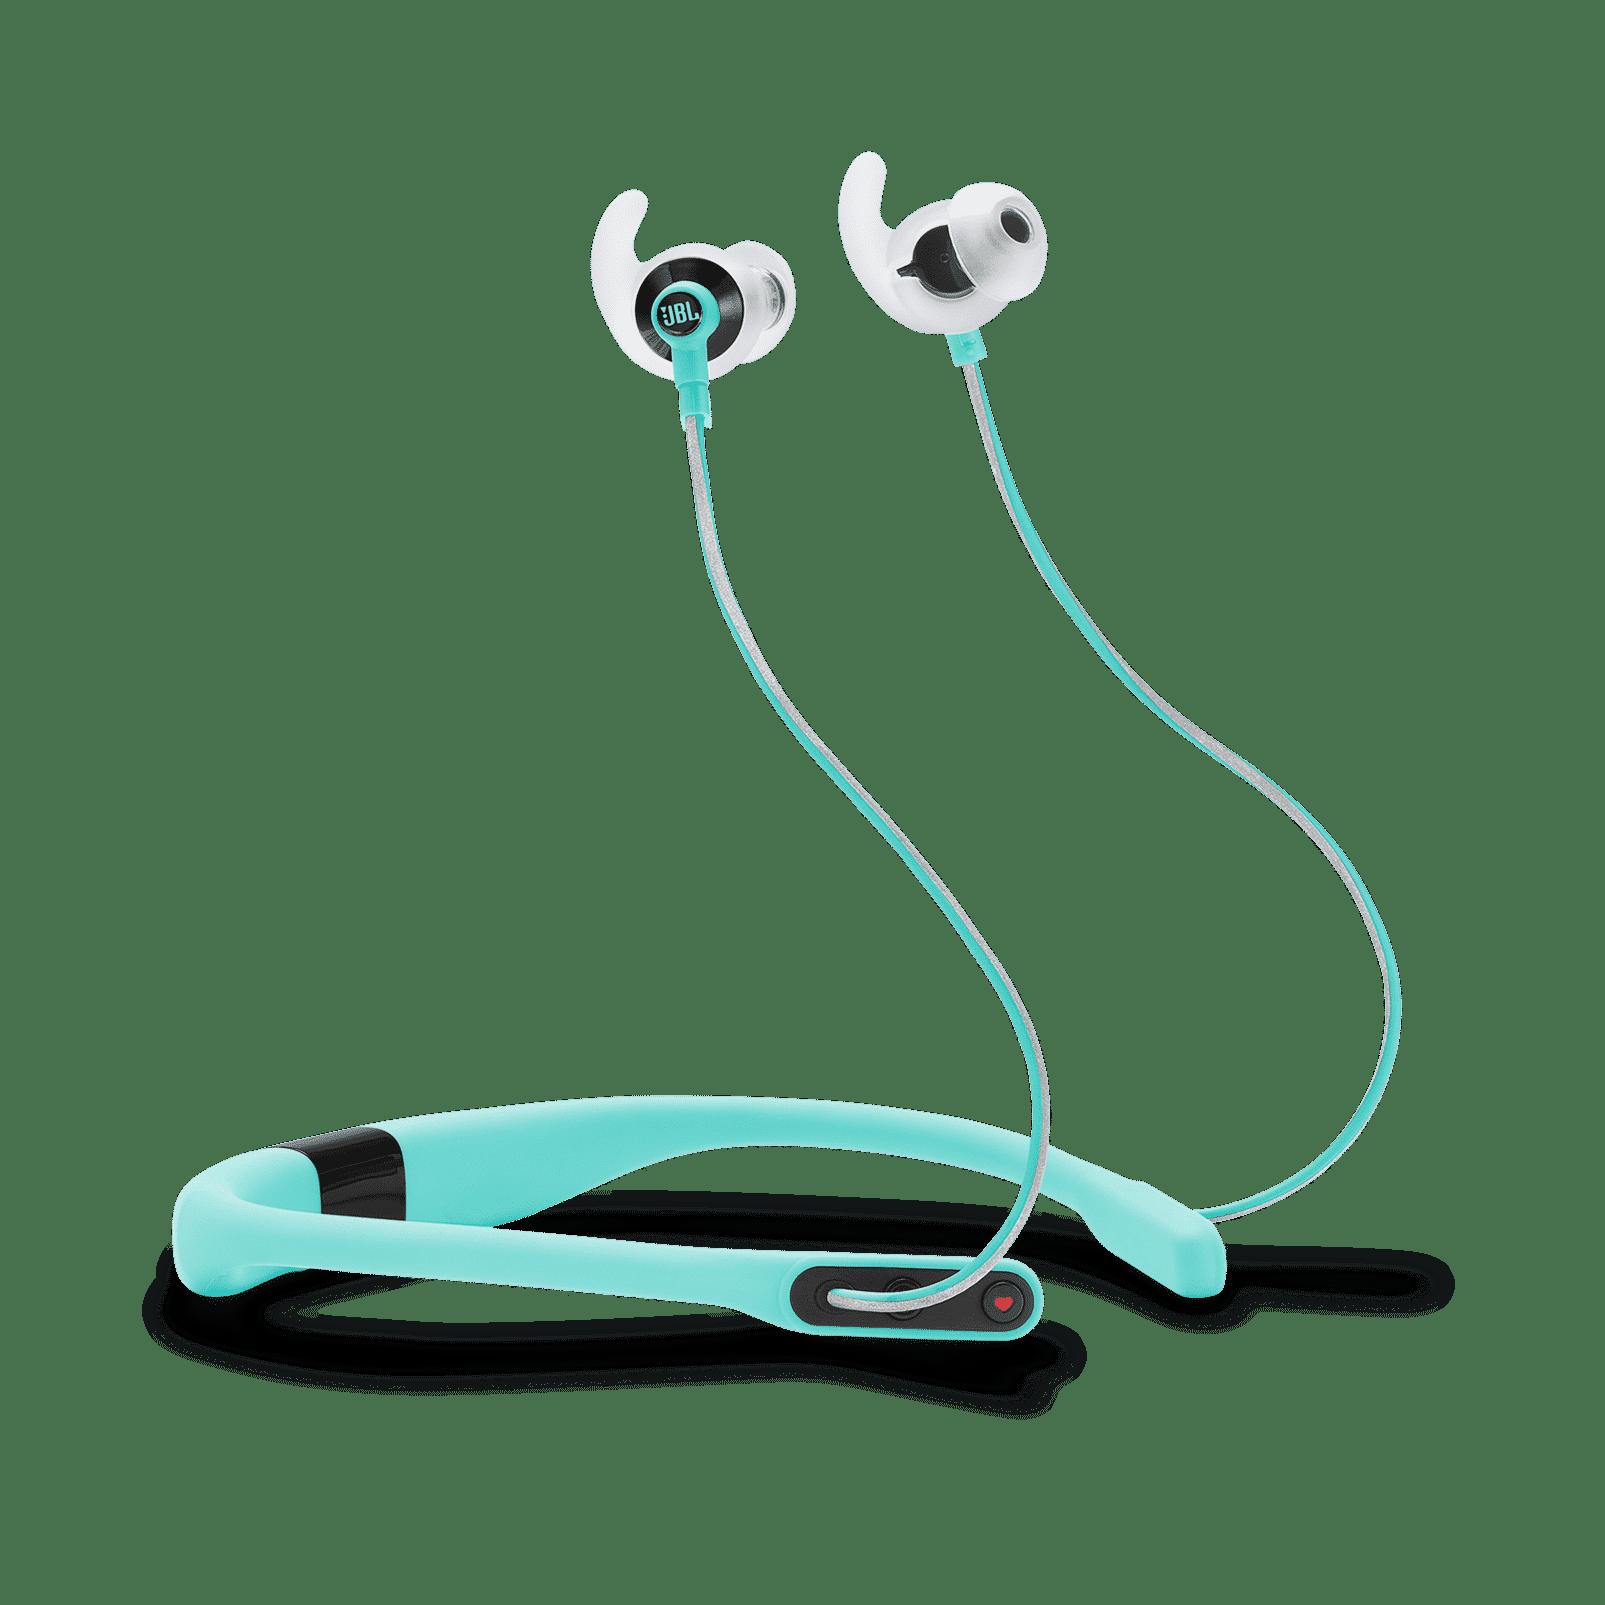 JBL-Reflect-Fit-Heart-Rate-Wireless-Headphones